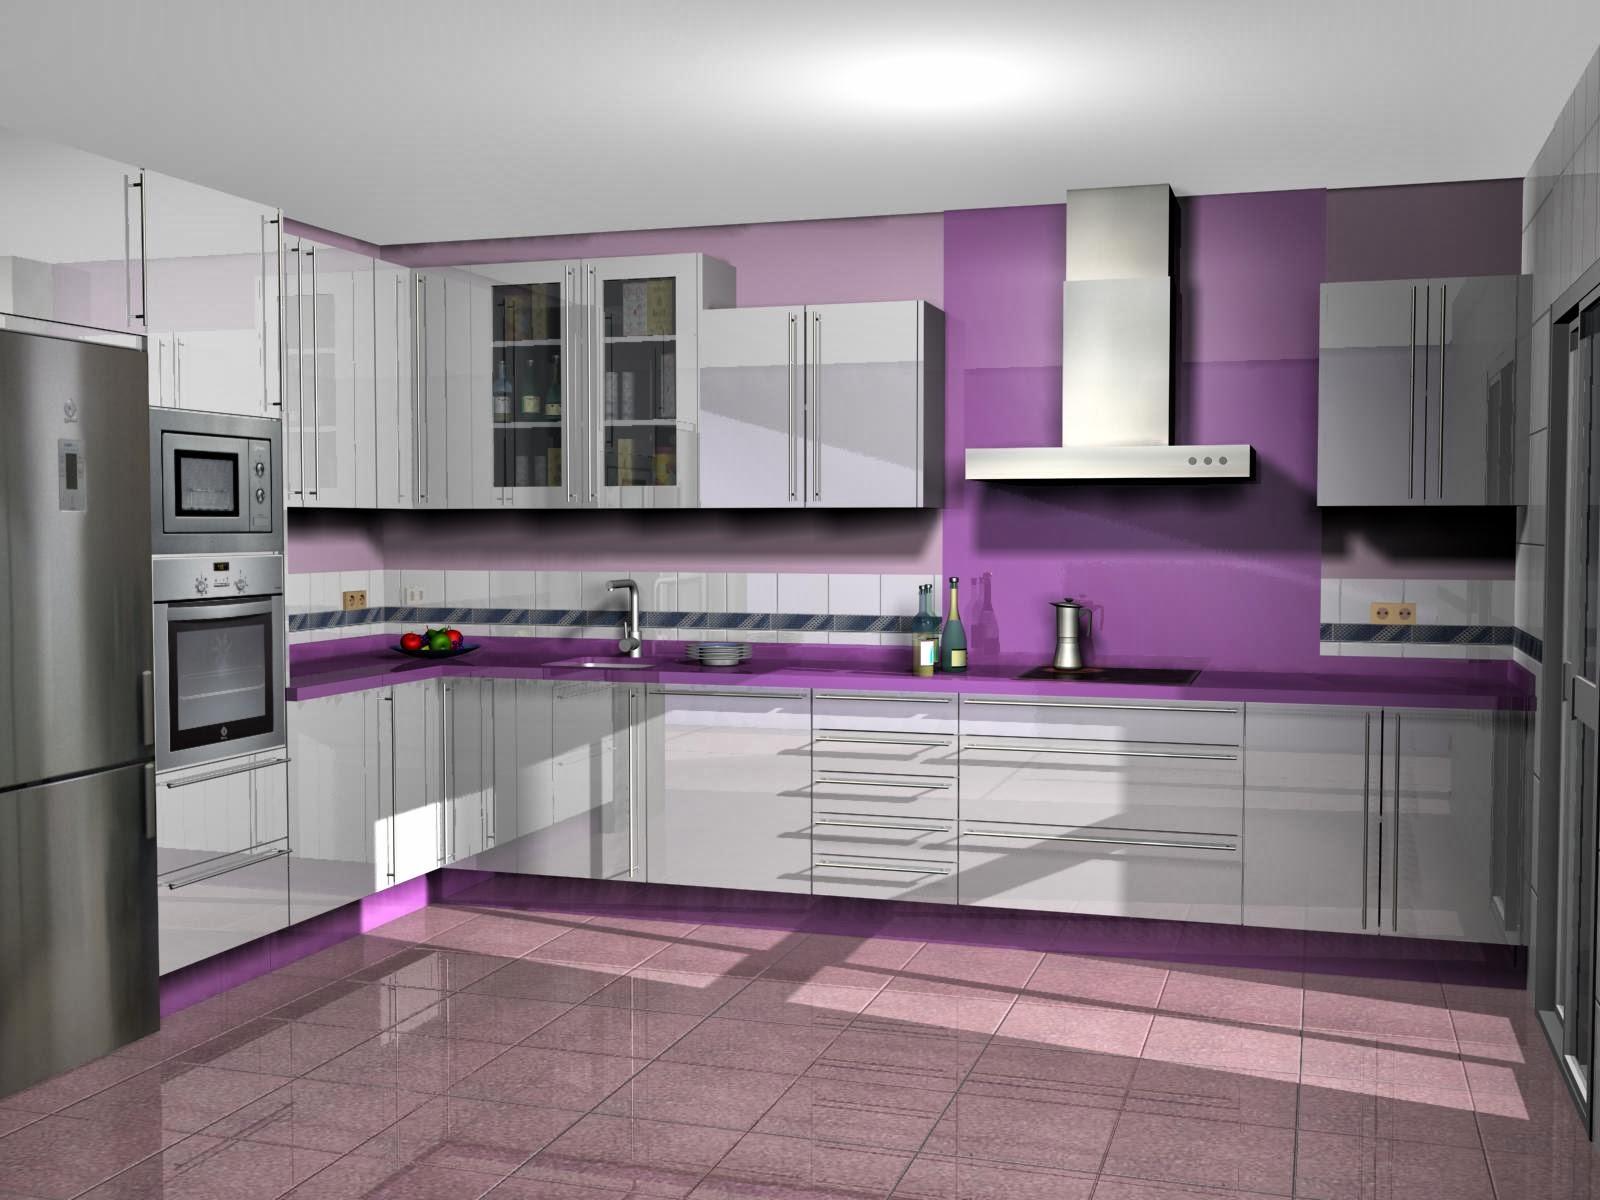 Decoraci n cocina for Diseno cocinas 3d gratis espanol